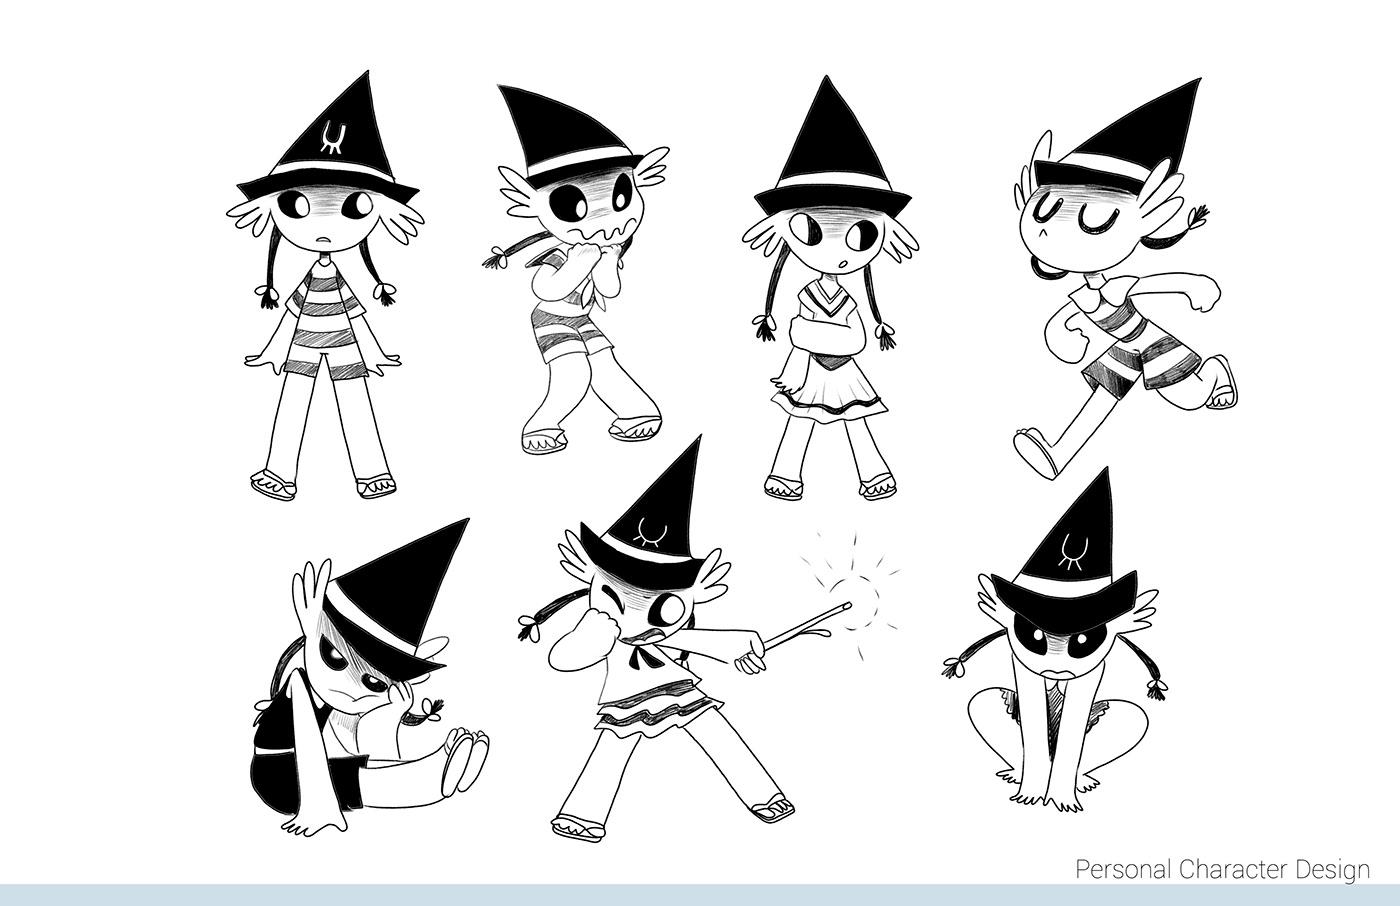 Image may contain: cartoon, sketch and drawing